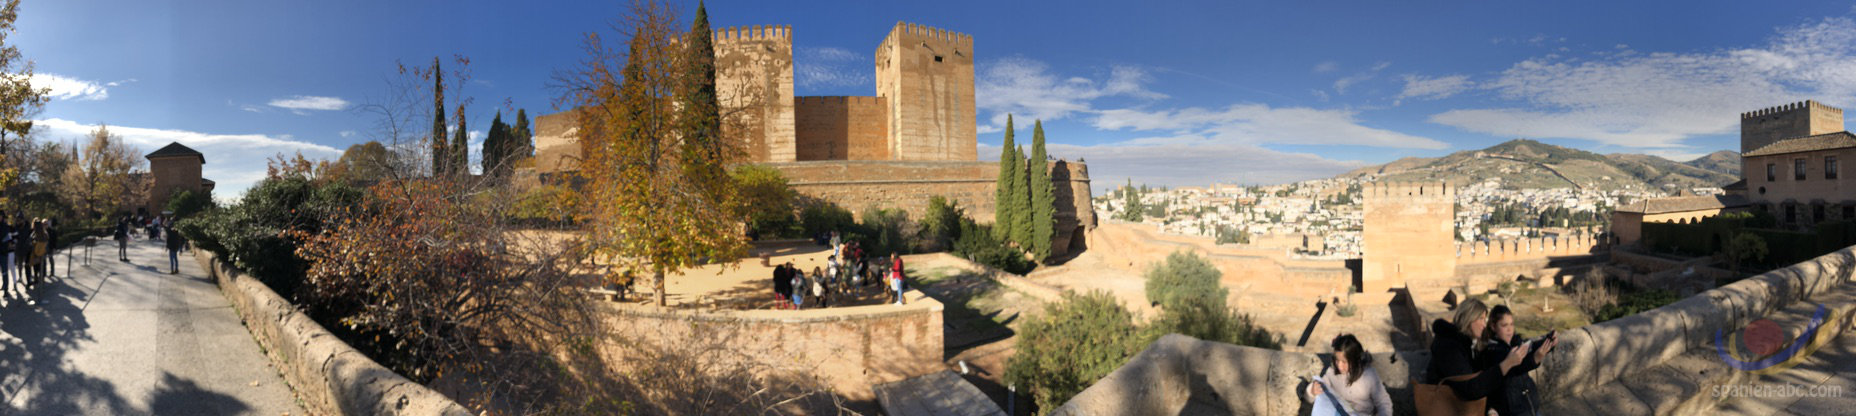 Alhambra Granada 360 Grad